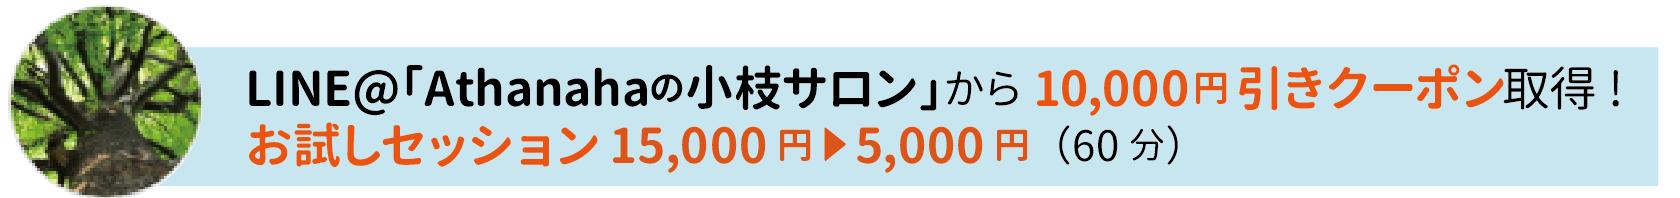 LINE@「Athanahaの小枝サロン」から10,000円引きクーポン取得! お試しセッション15,000円▼5,000円(60分)